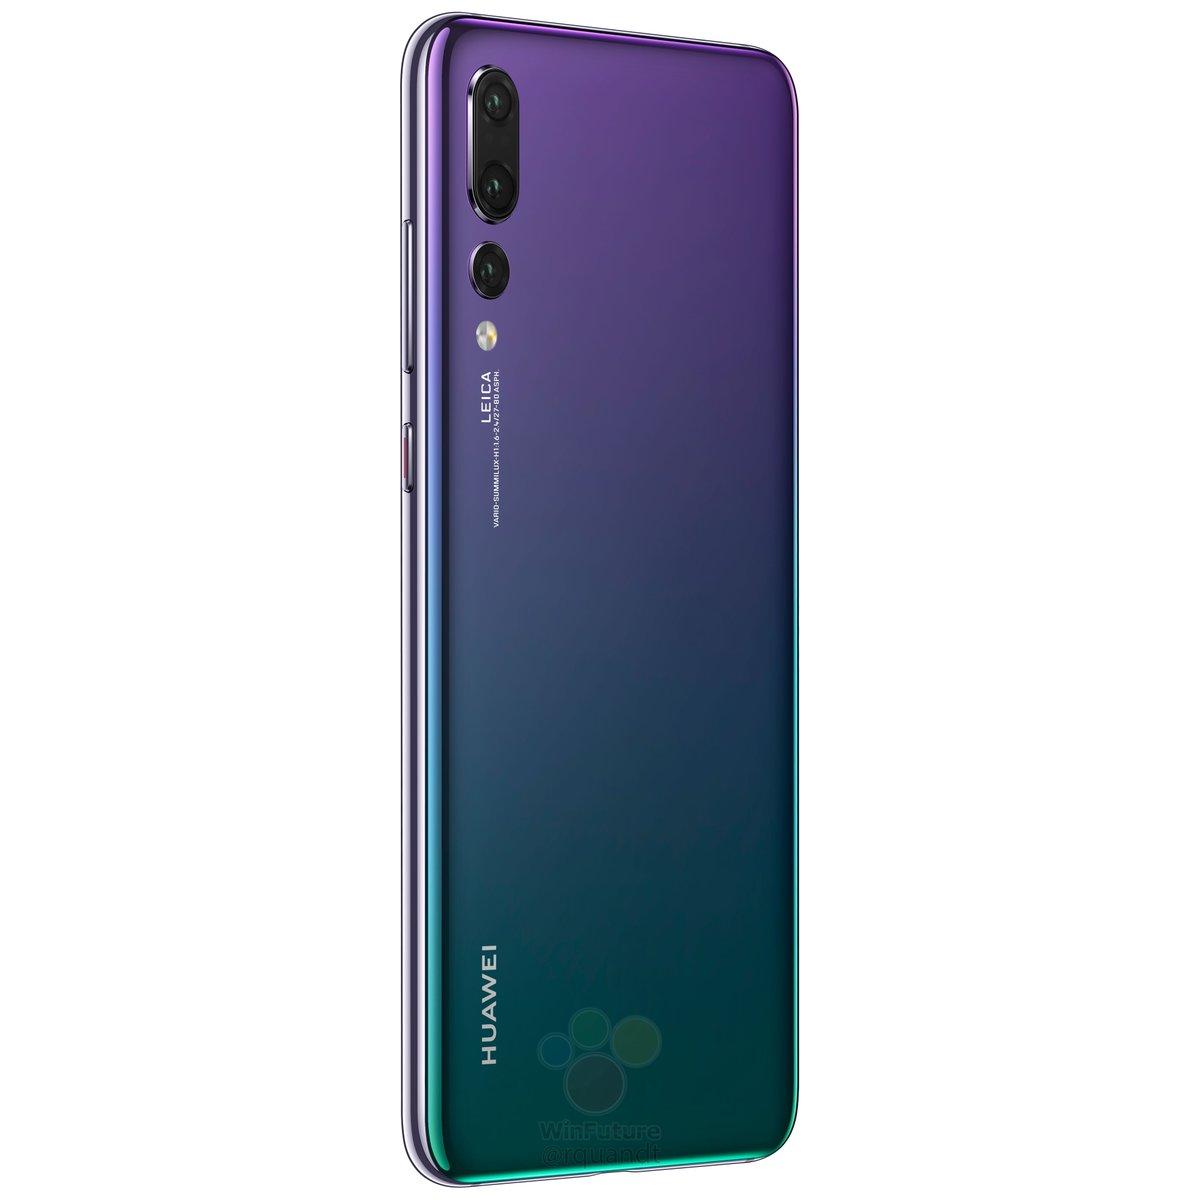 Huawei-P20-Pro-14